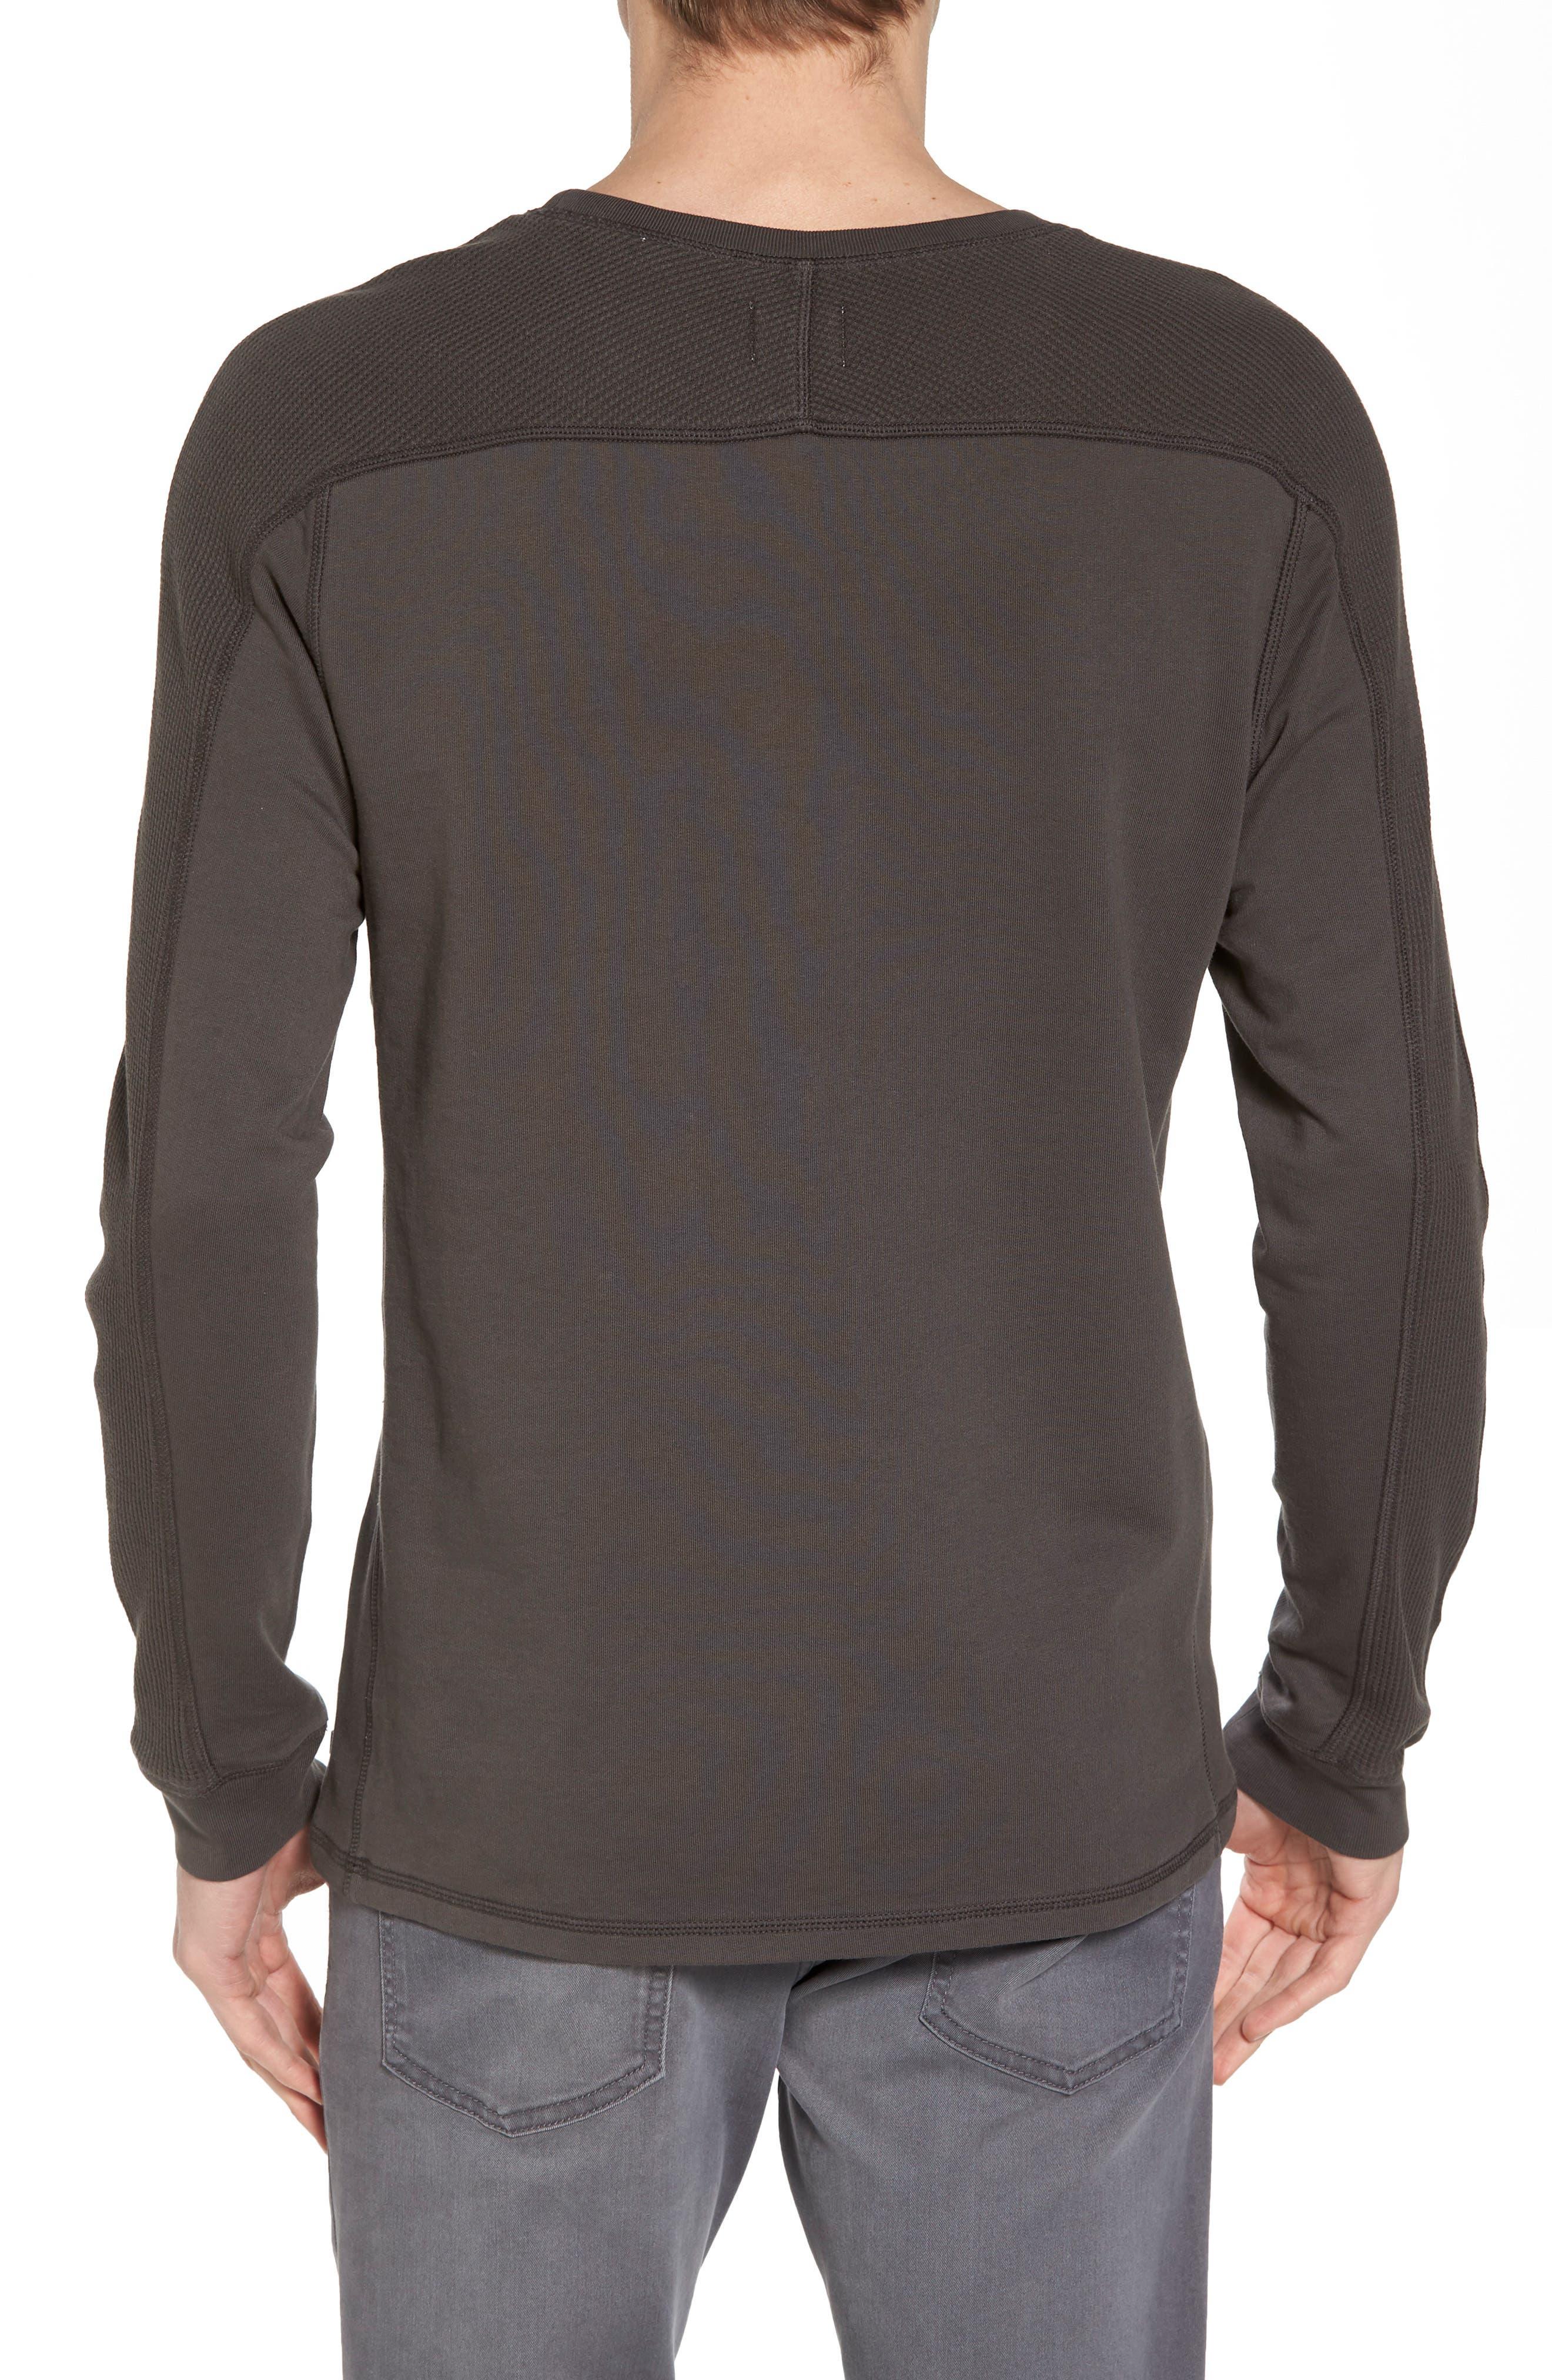 Trevor Slim Fit Crewneck Shirt,                             Alternate thumbnail 2, color,                             032